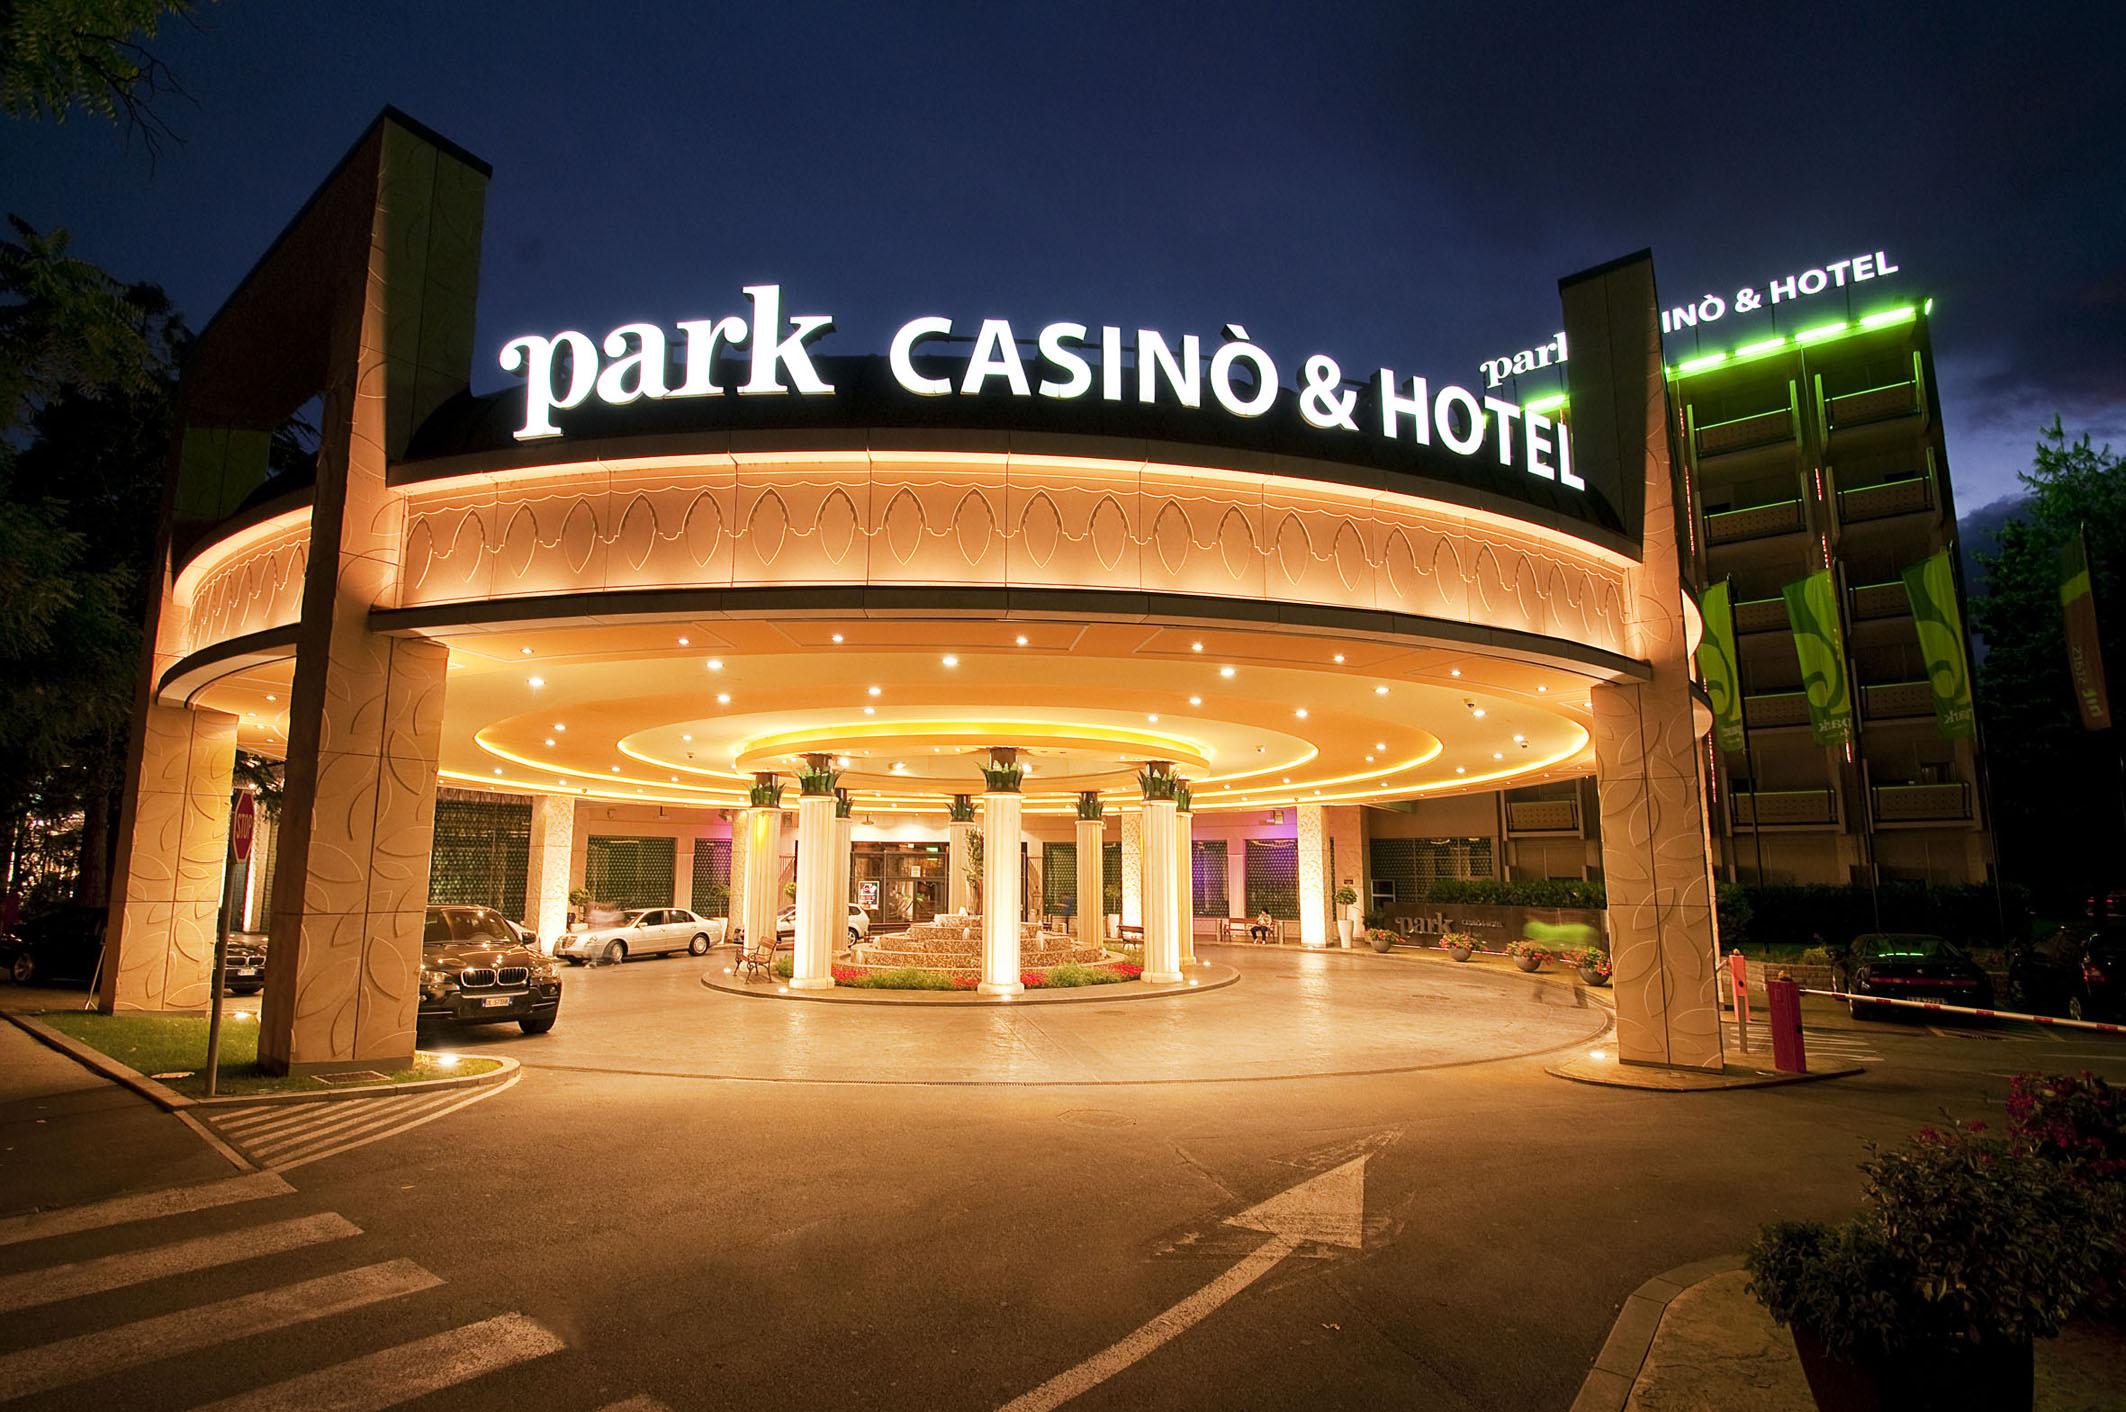 Star city casino car park rates casino themed stationary